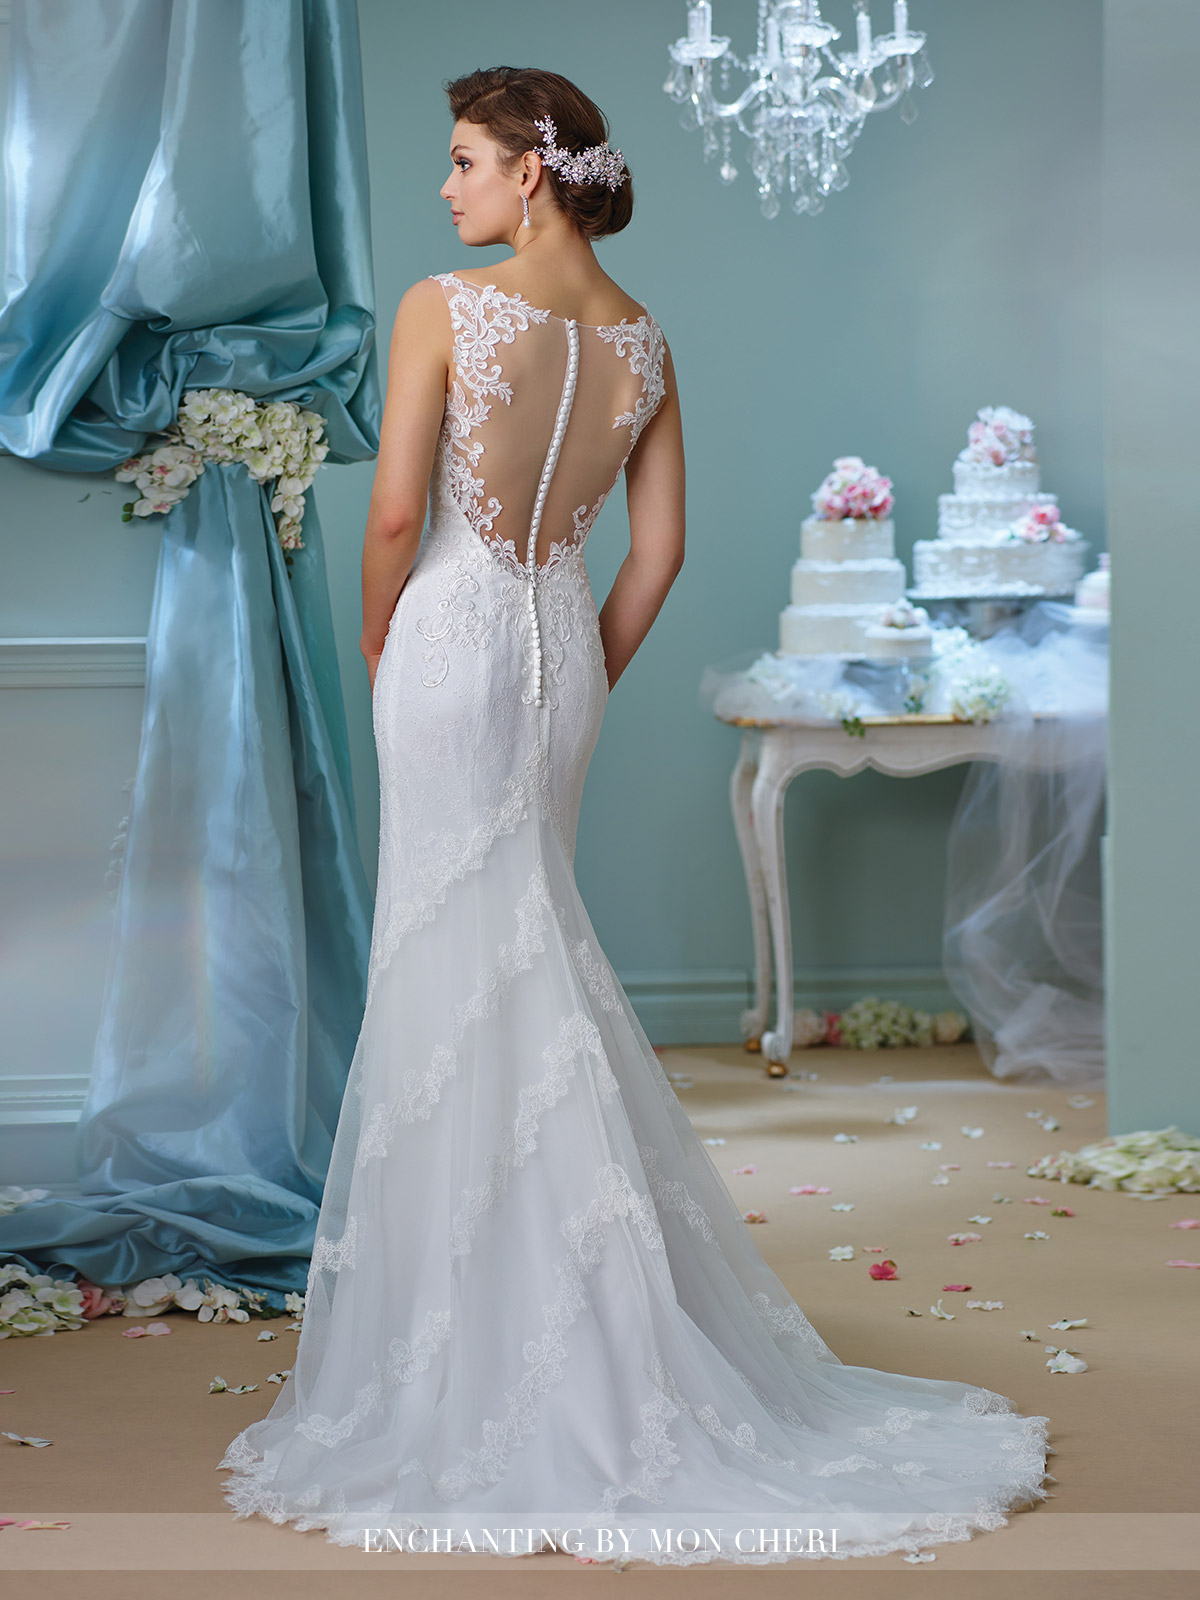 enchanting wedding dresses photo - 1